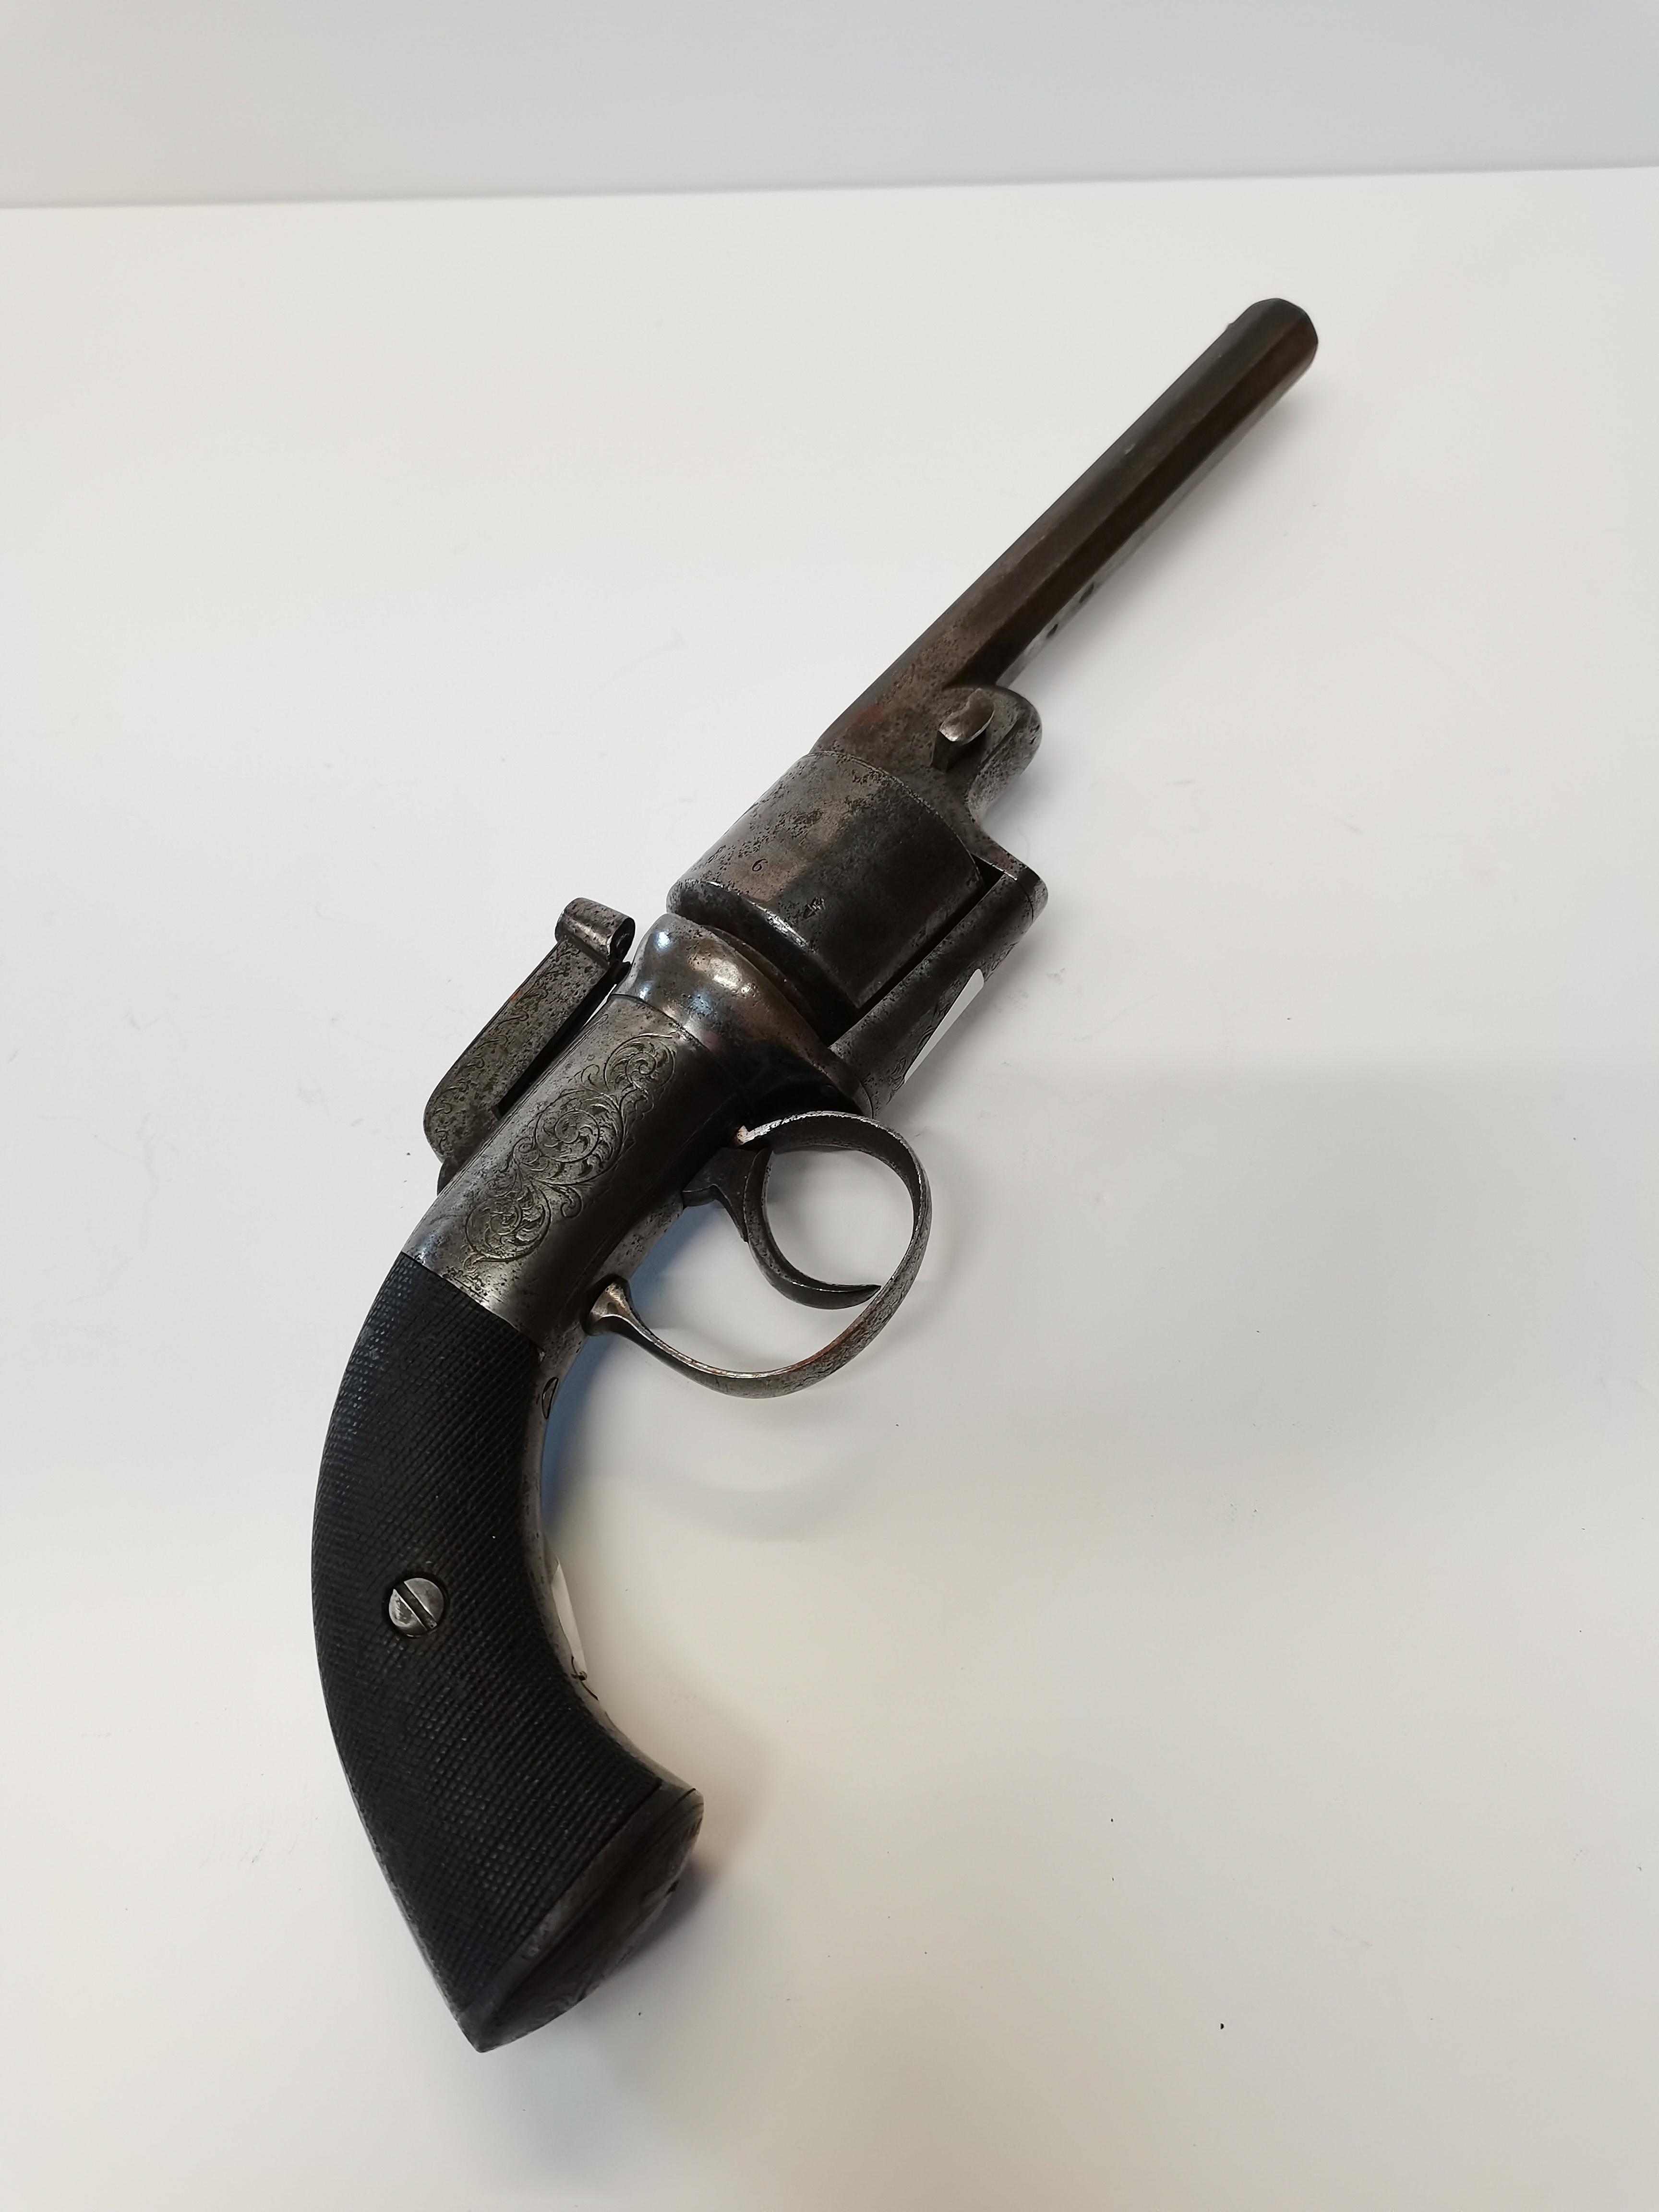 George Gibbs of Bristol 6 shot percusson revolver - Image 2 of 7